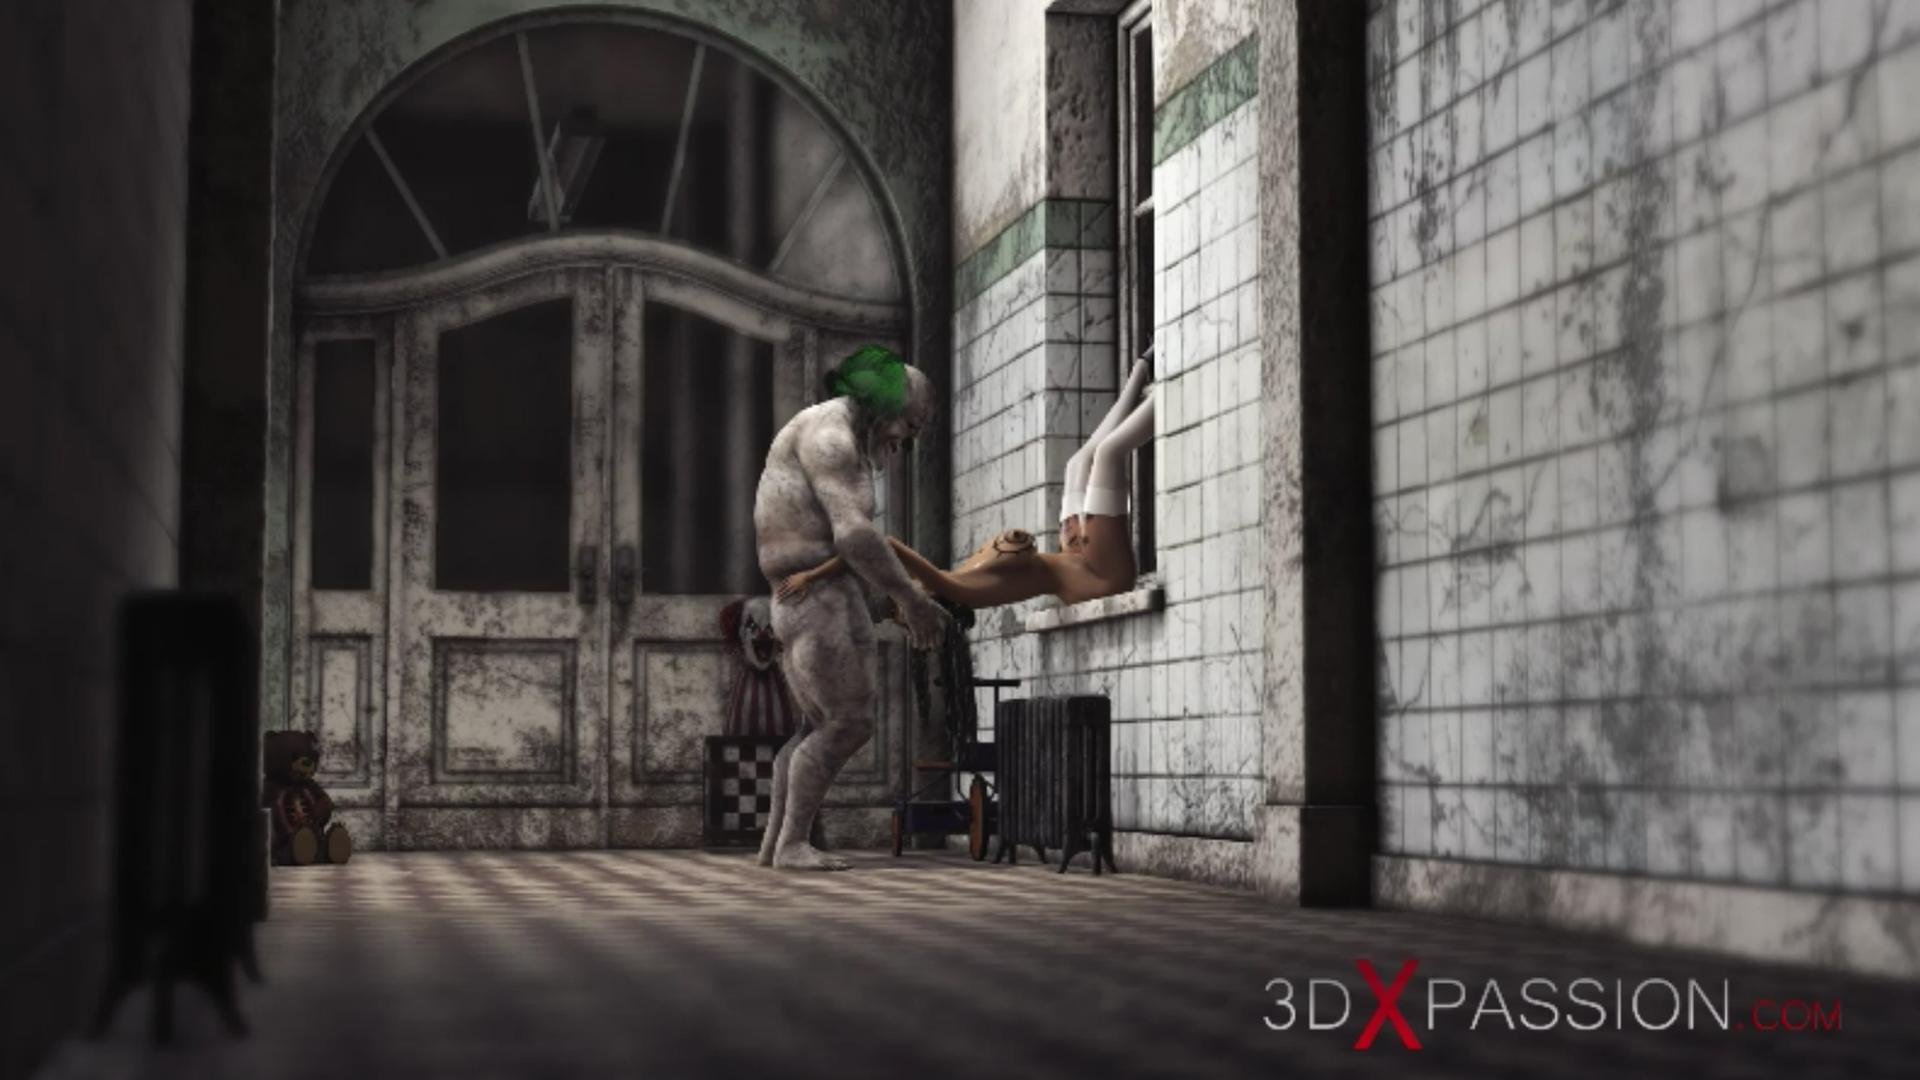 Evil clown extreme irrumatio sweet schoolgirl abandoned hospital